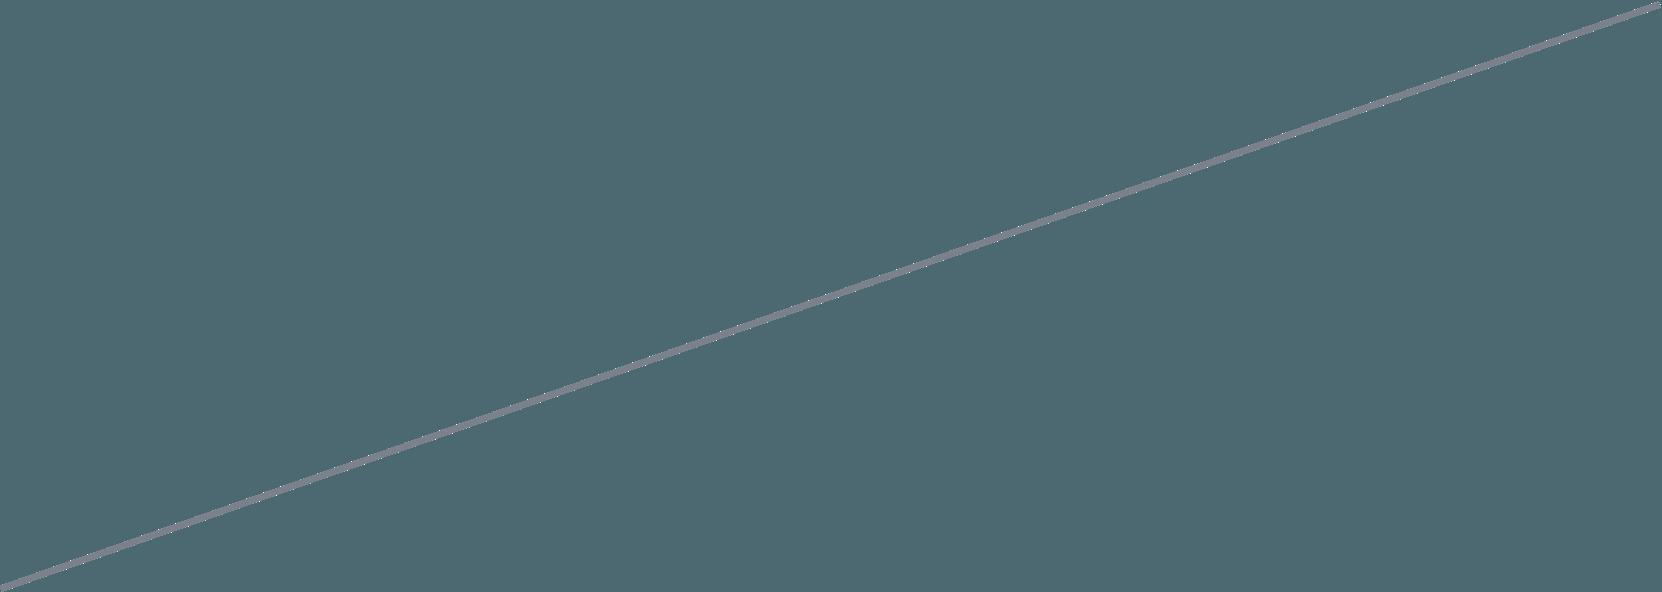 line3_big.png